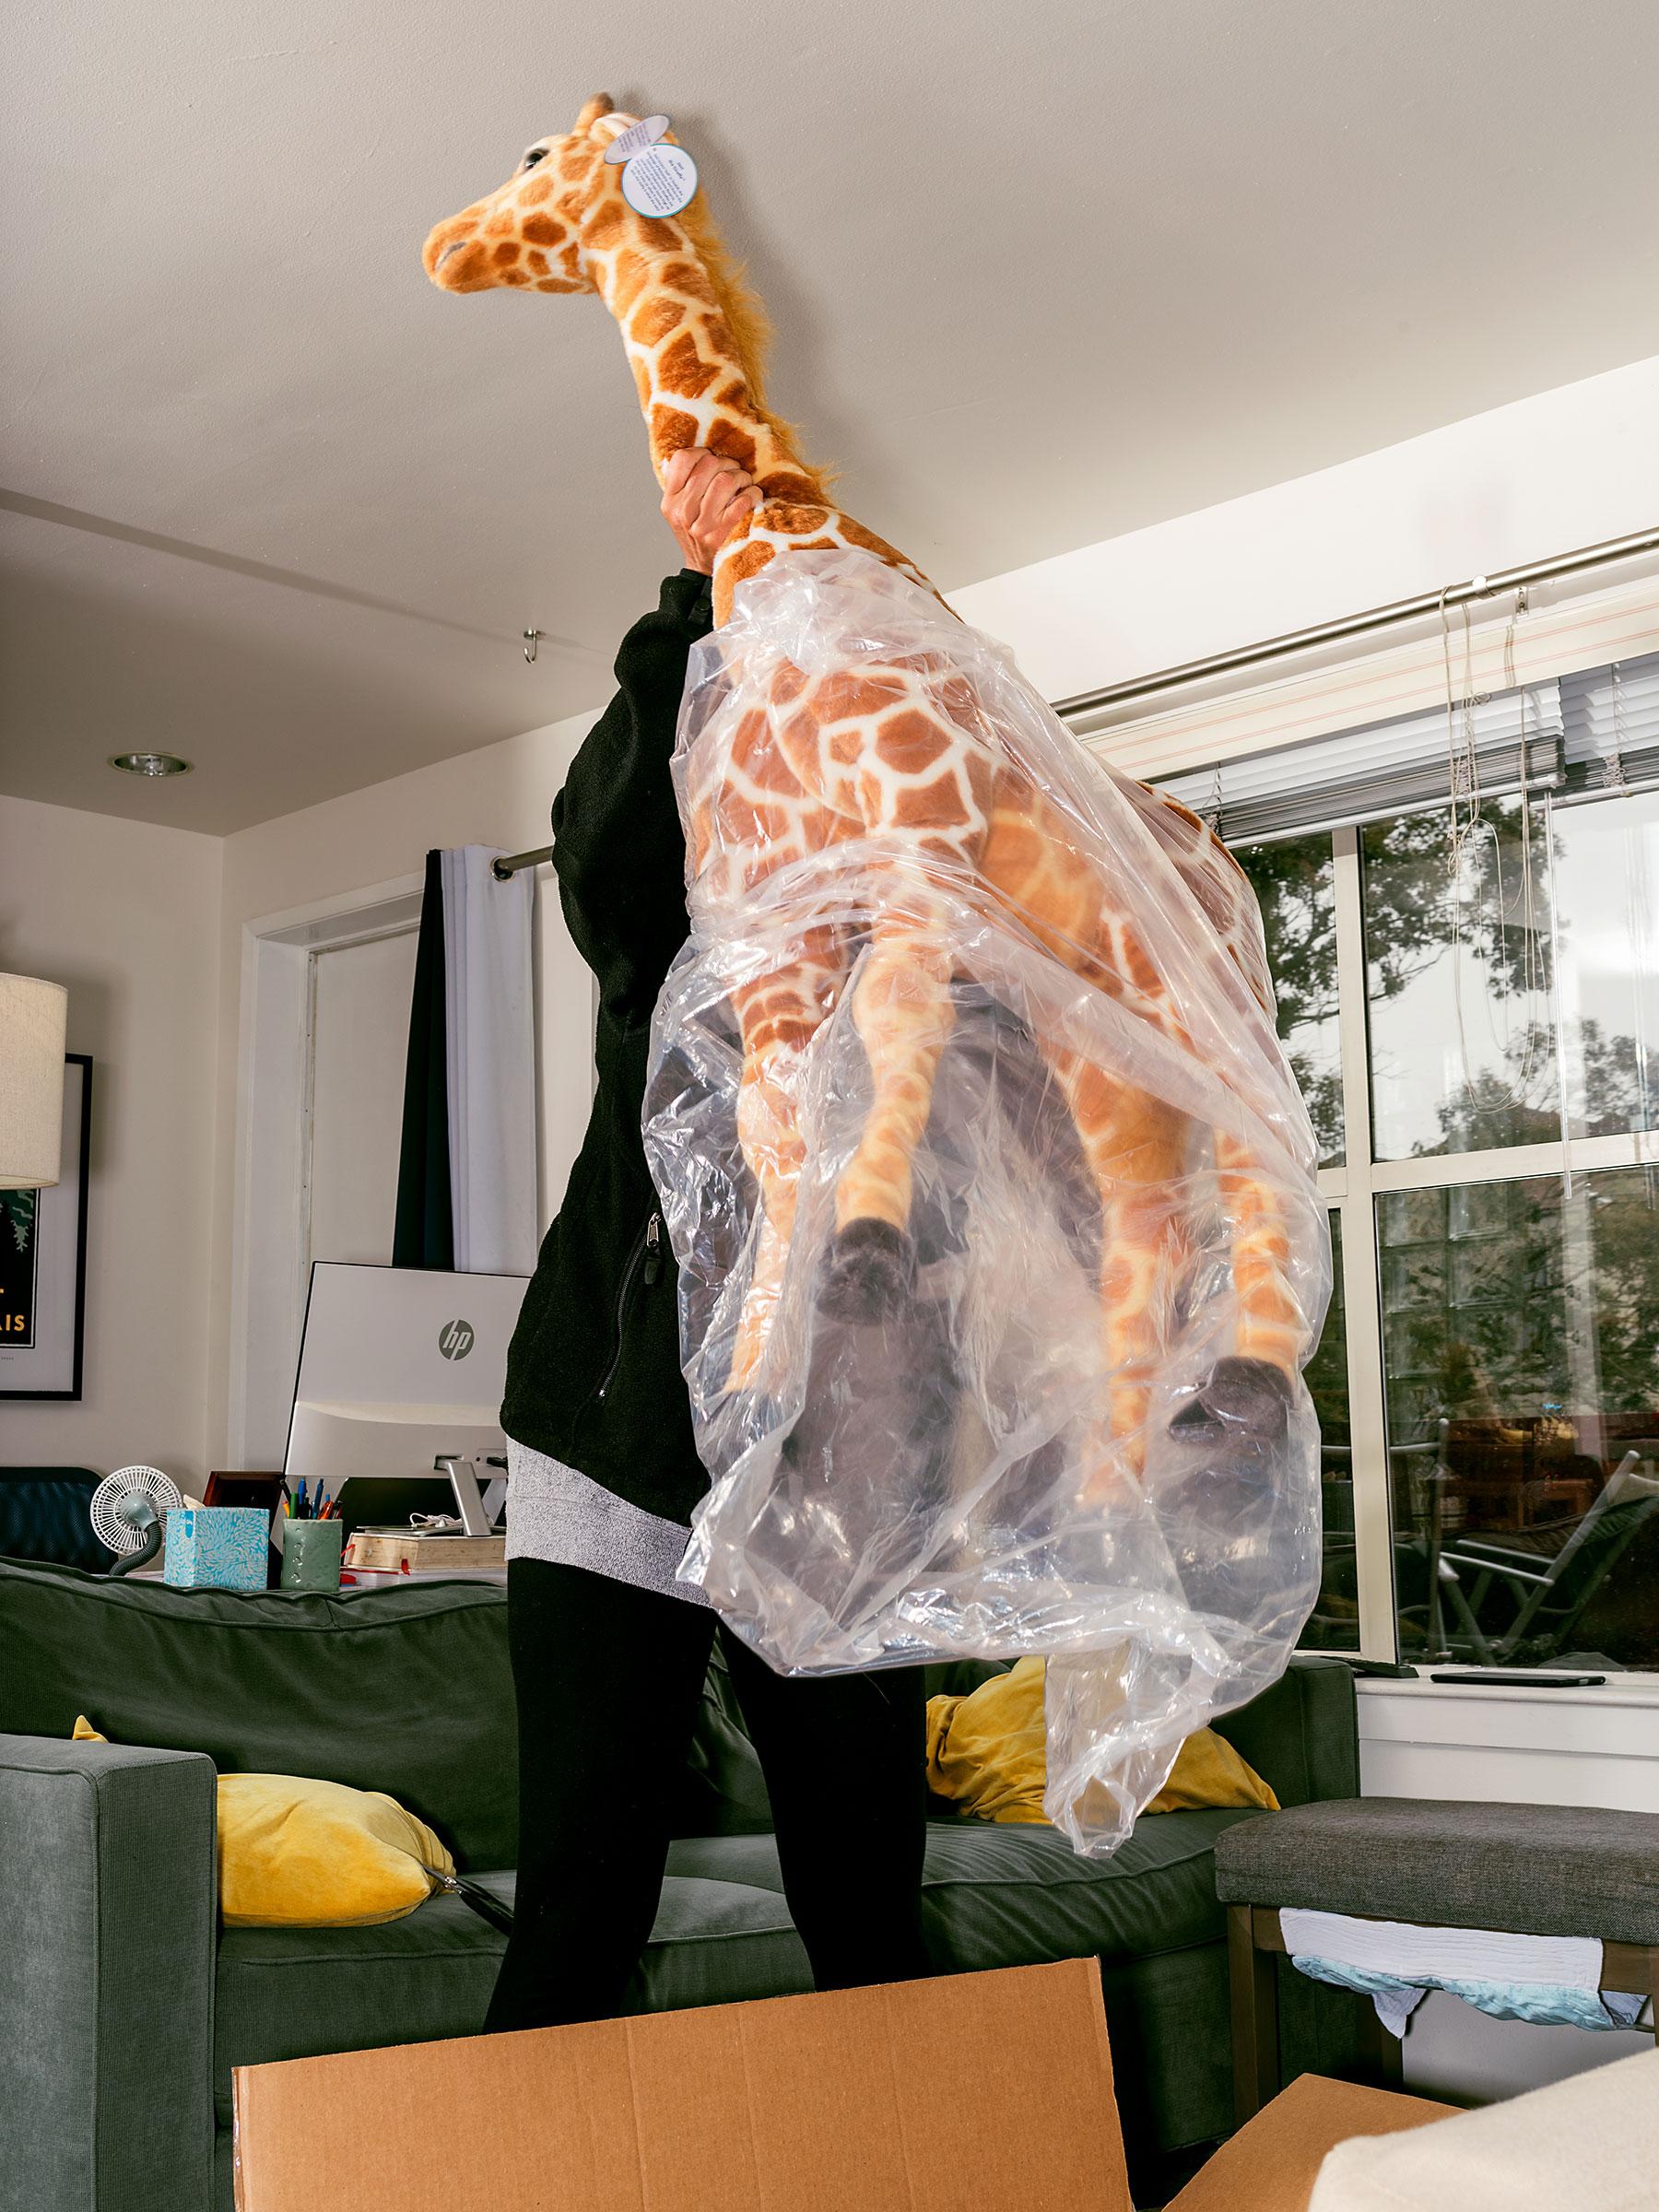 Jani the giraffe is unpacked in San Francisco.